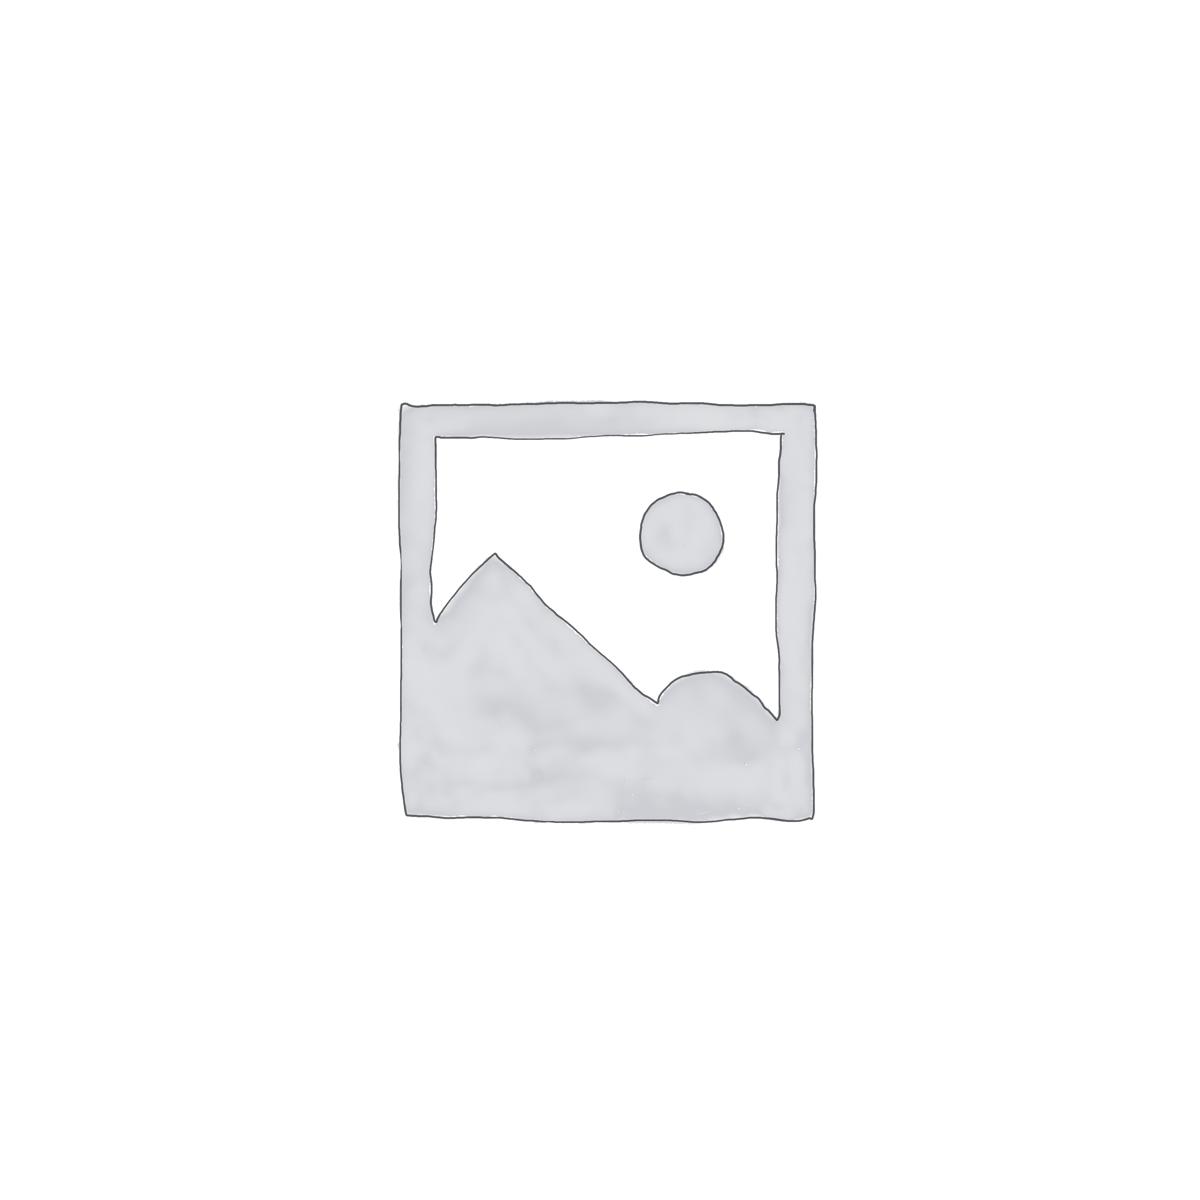 Trigon Geometric Shapes Wallpaper Mural